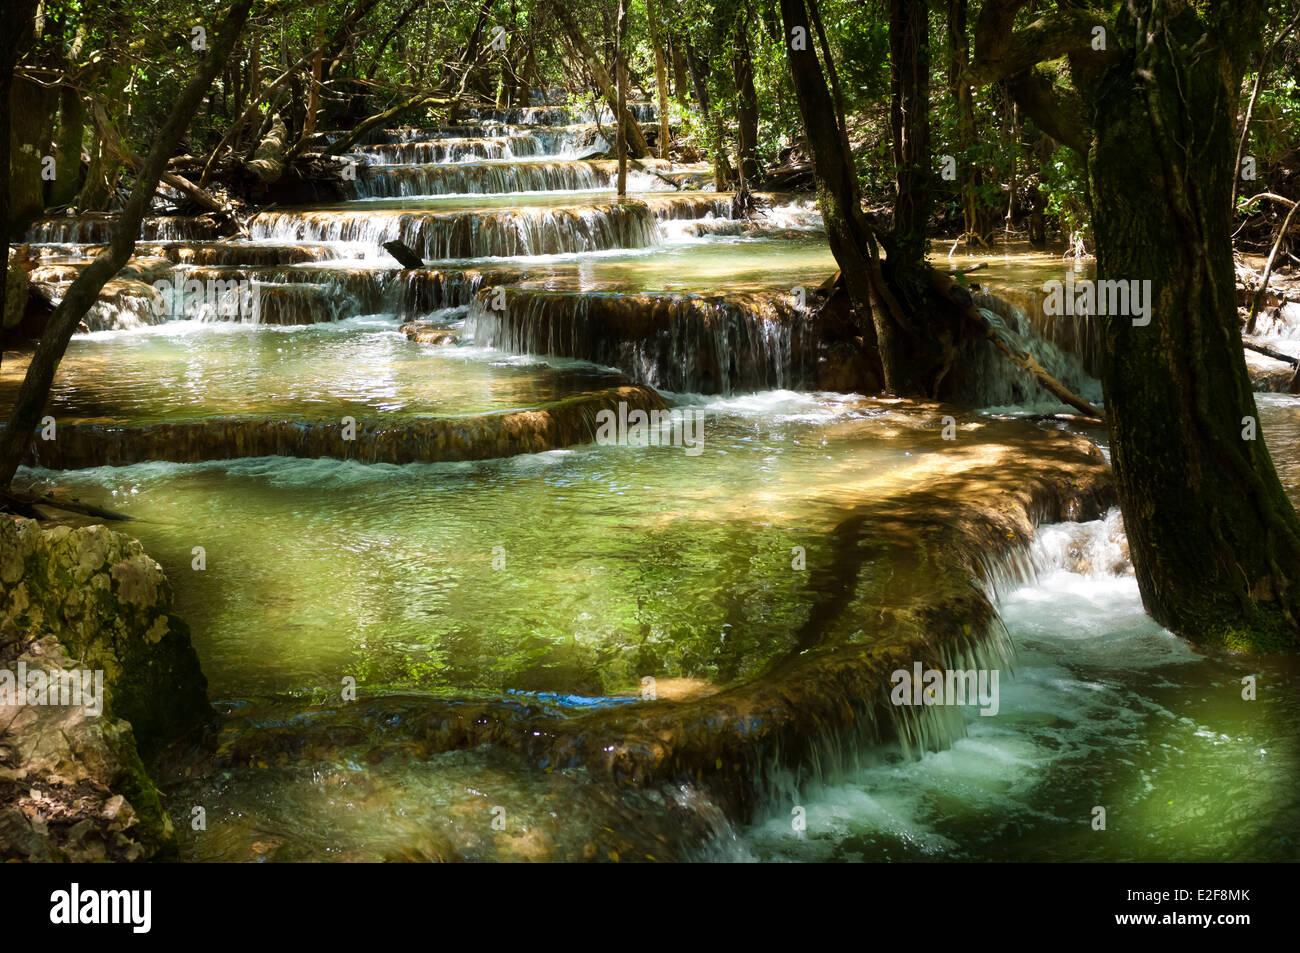 France, Var, Nans les Pins, calcite pools of the Huveaune springs, Sainte Baume range - Stock Image